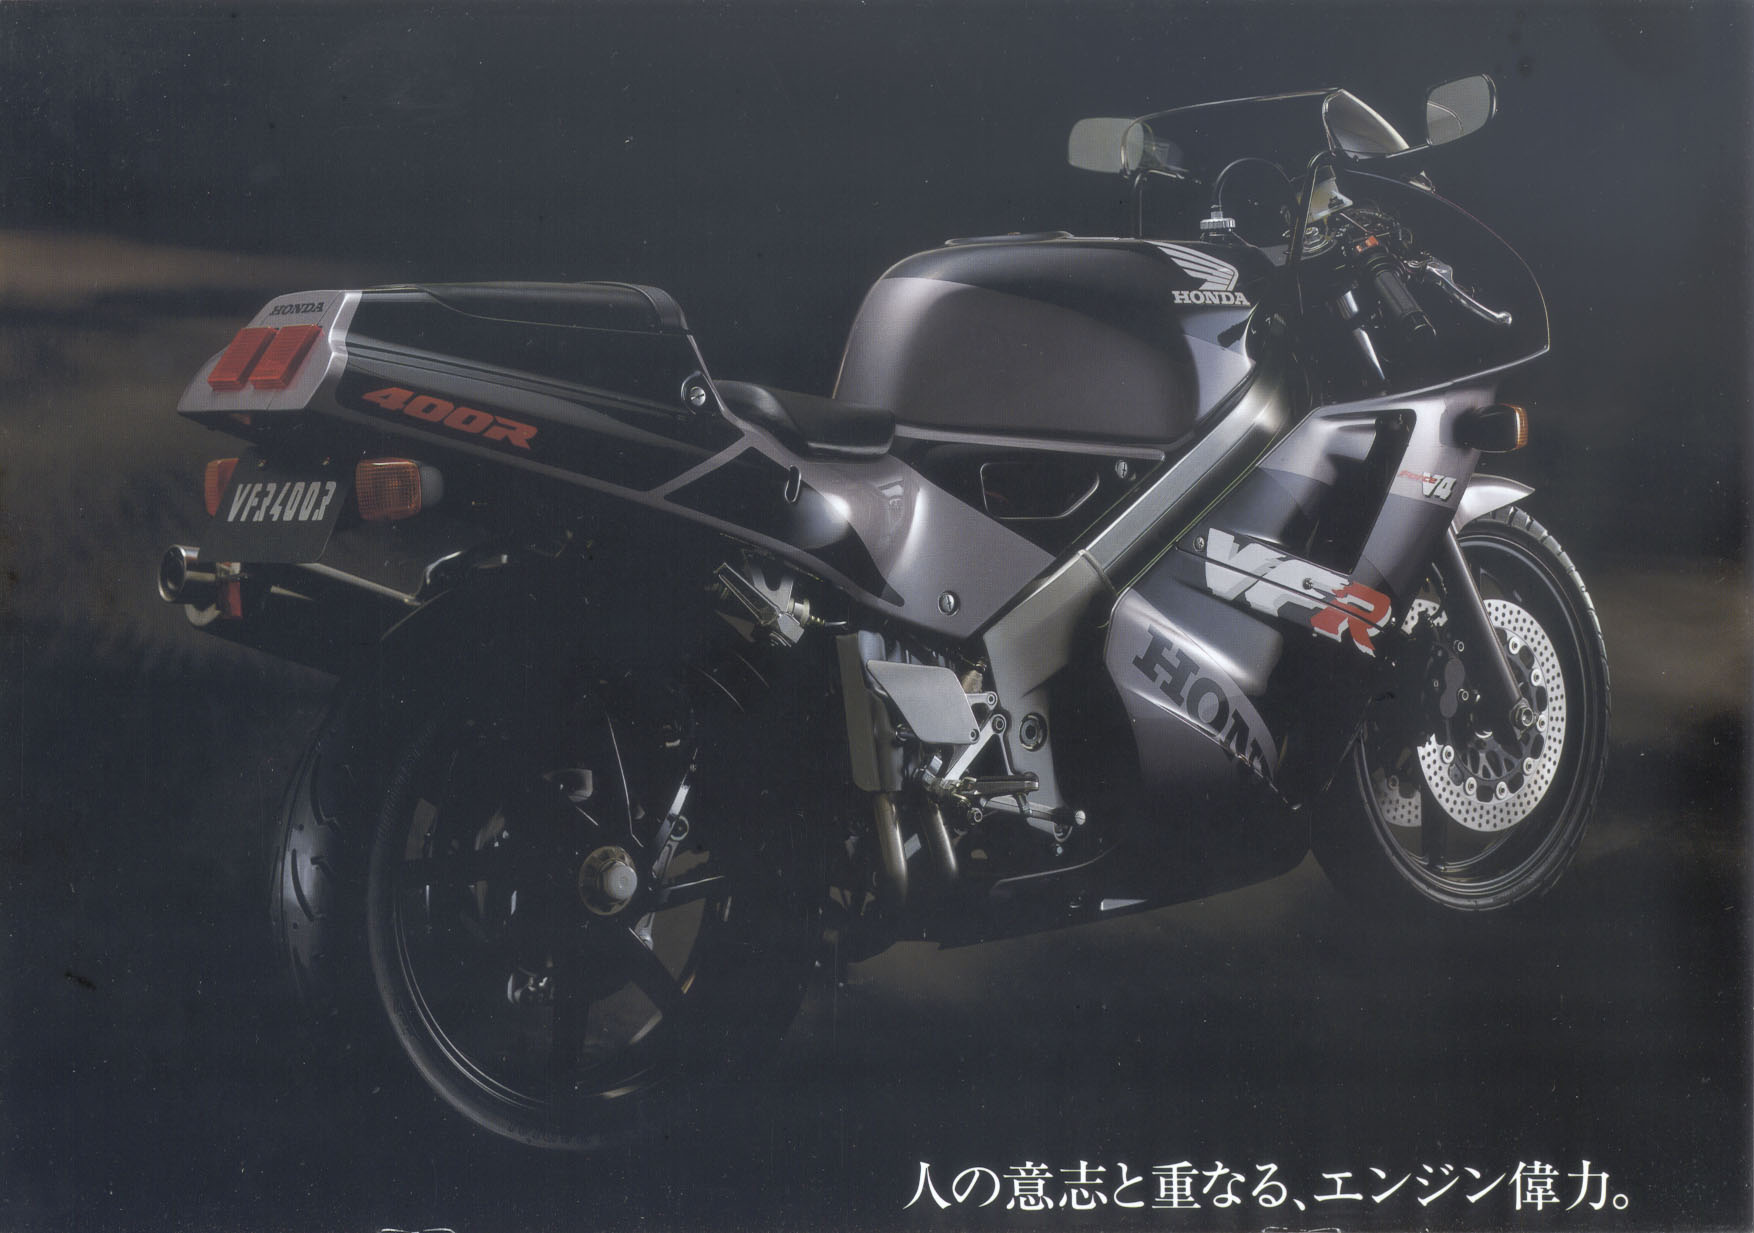 1990 Honda Vfr400r Electrical System Diagram